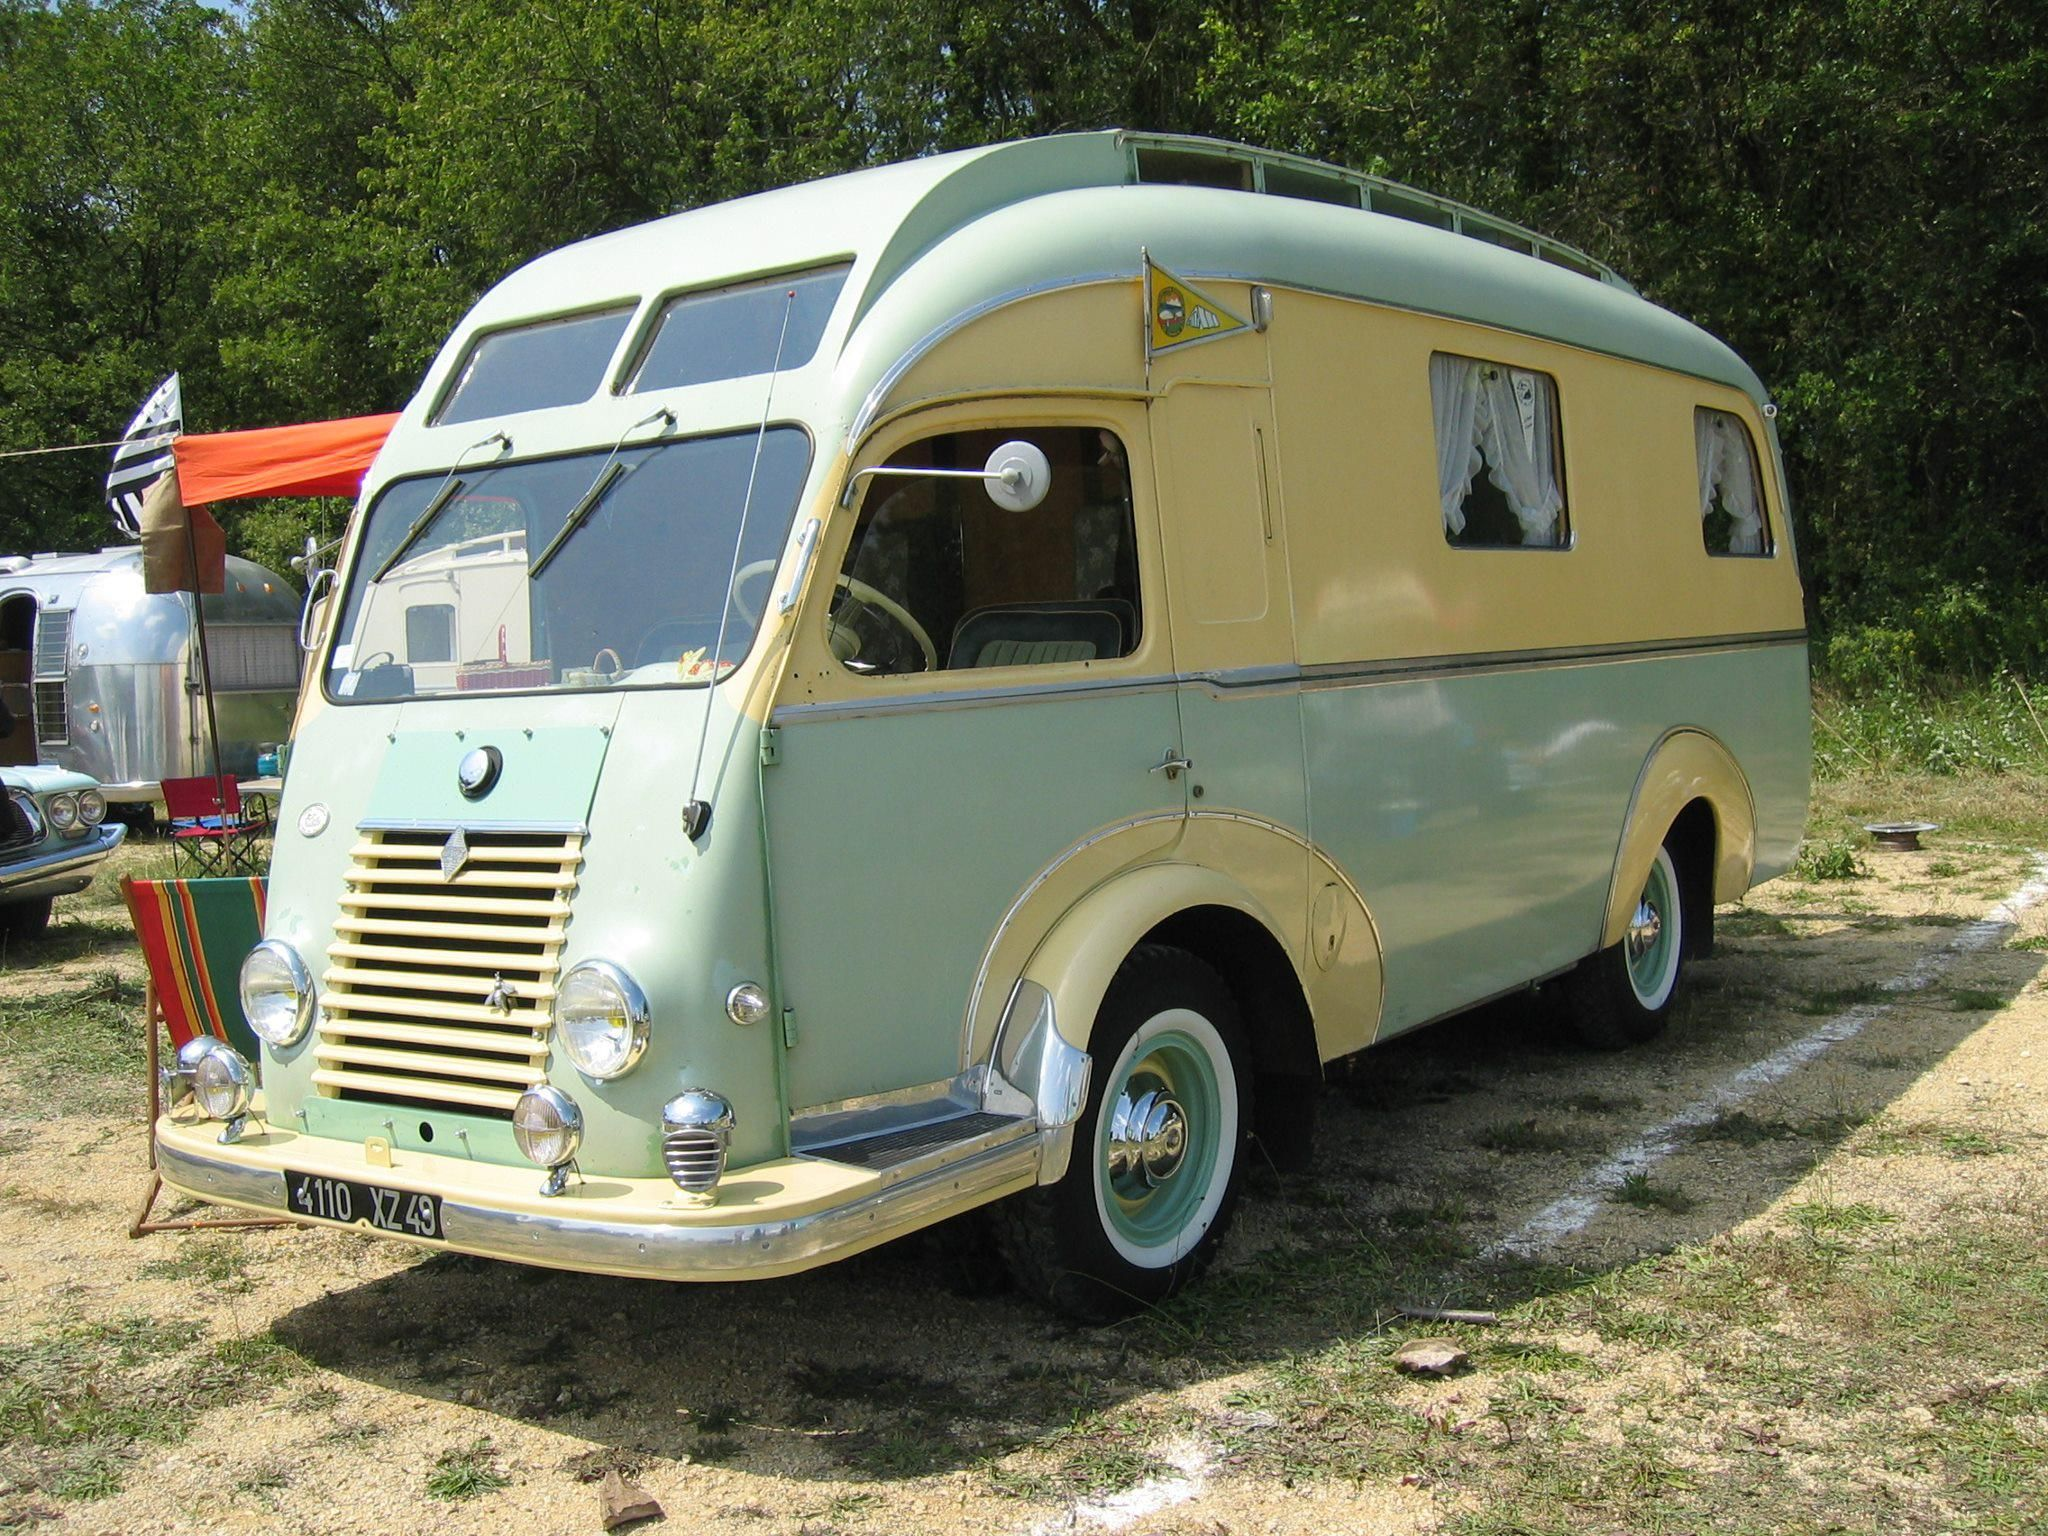 Renault Camper Vintage Camper Vintage Travel Trailers Vintage Trailers